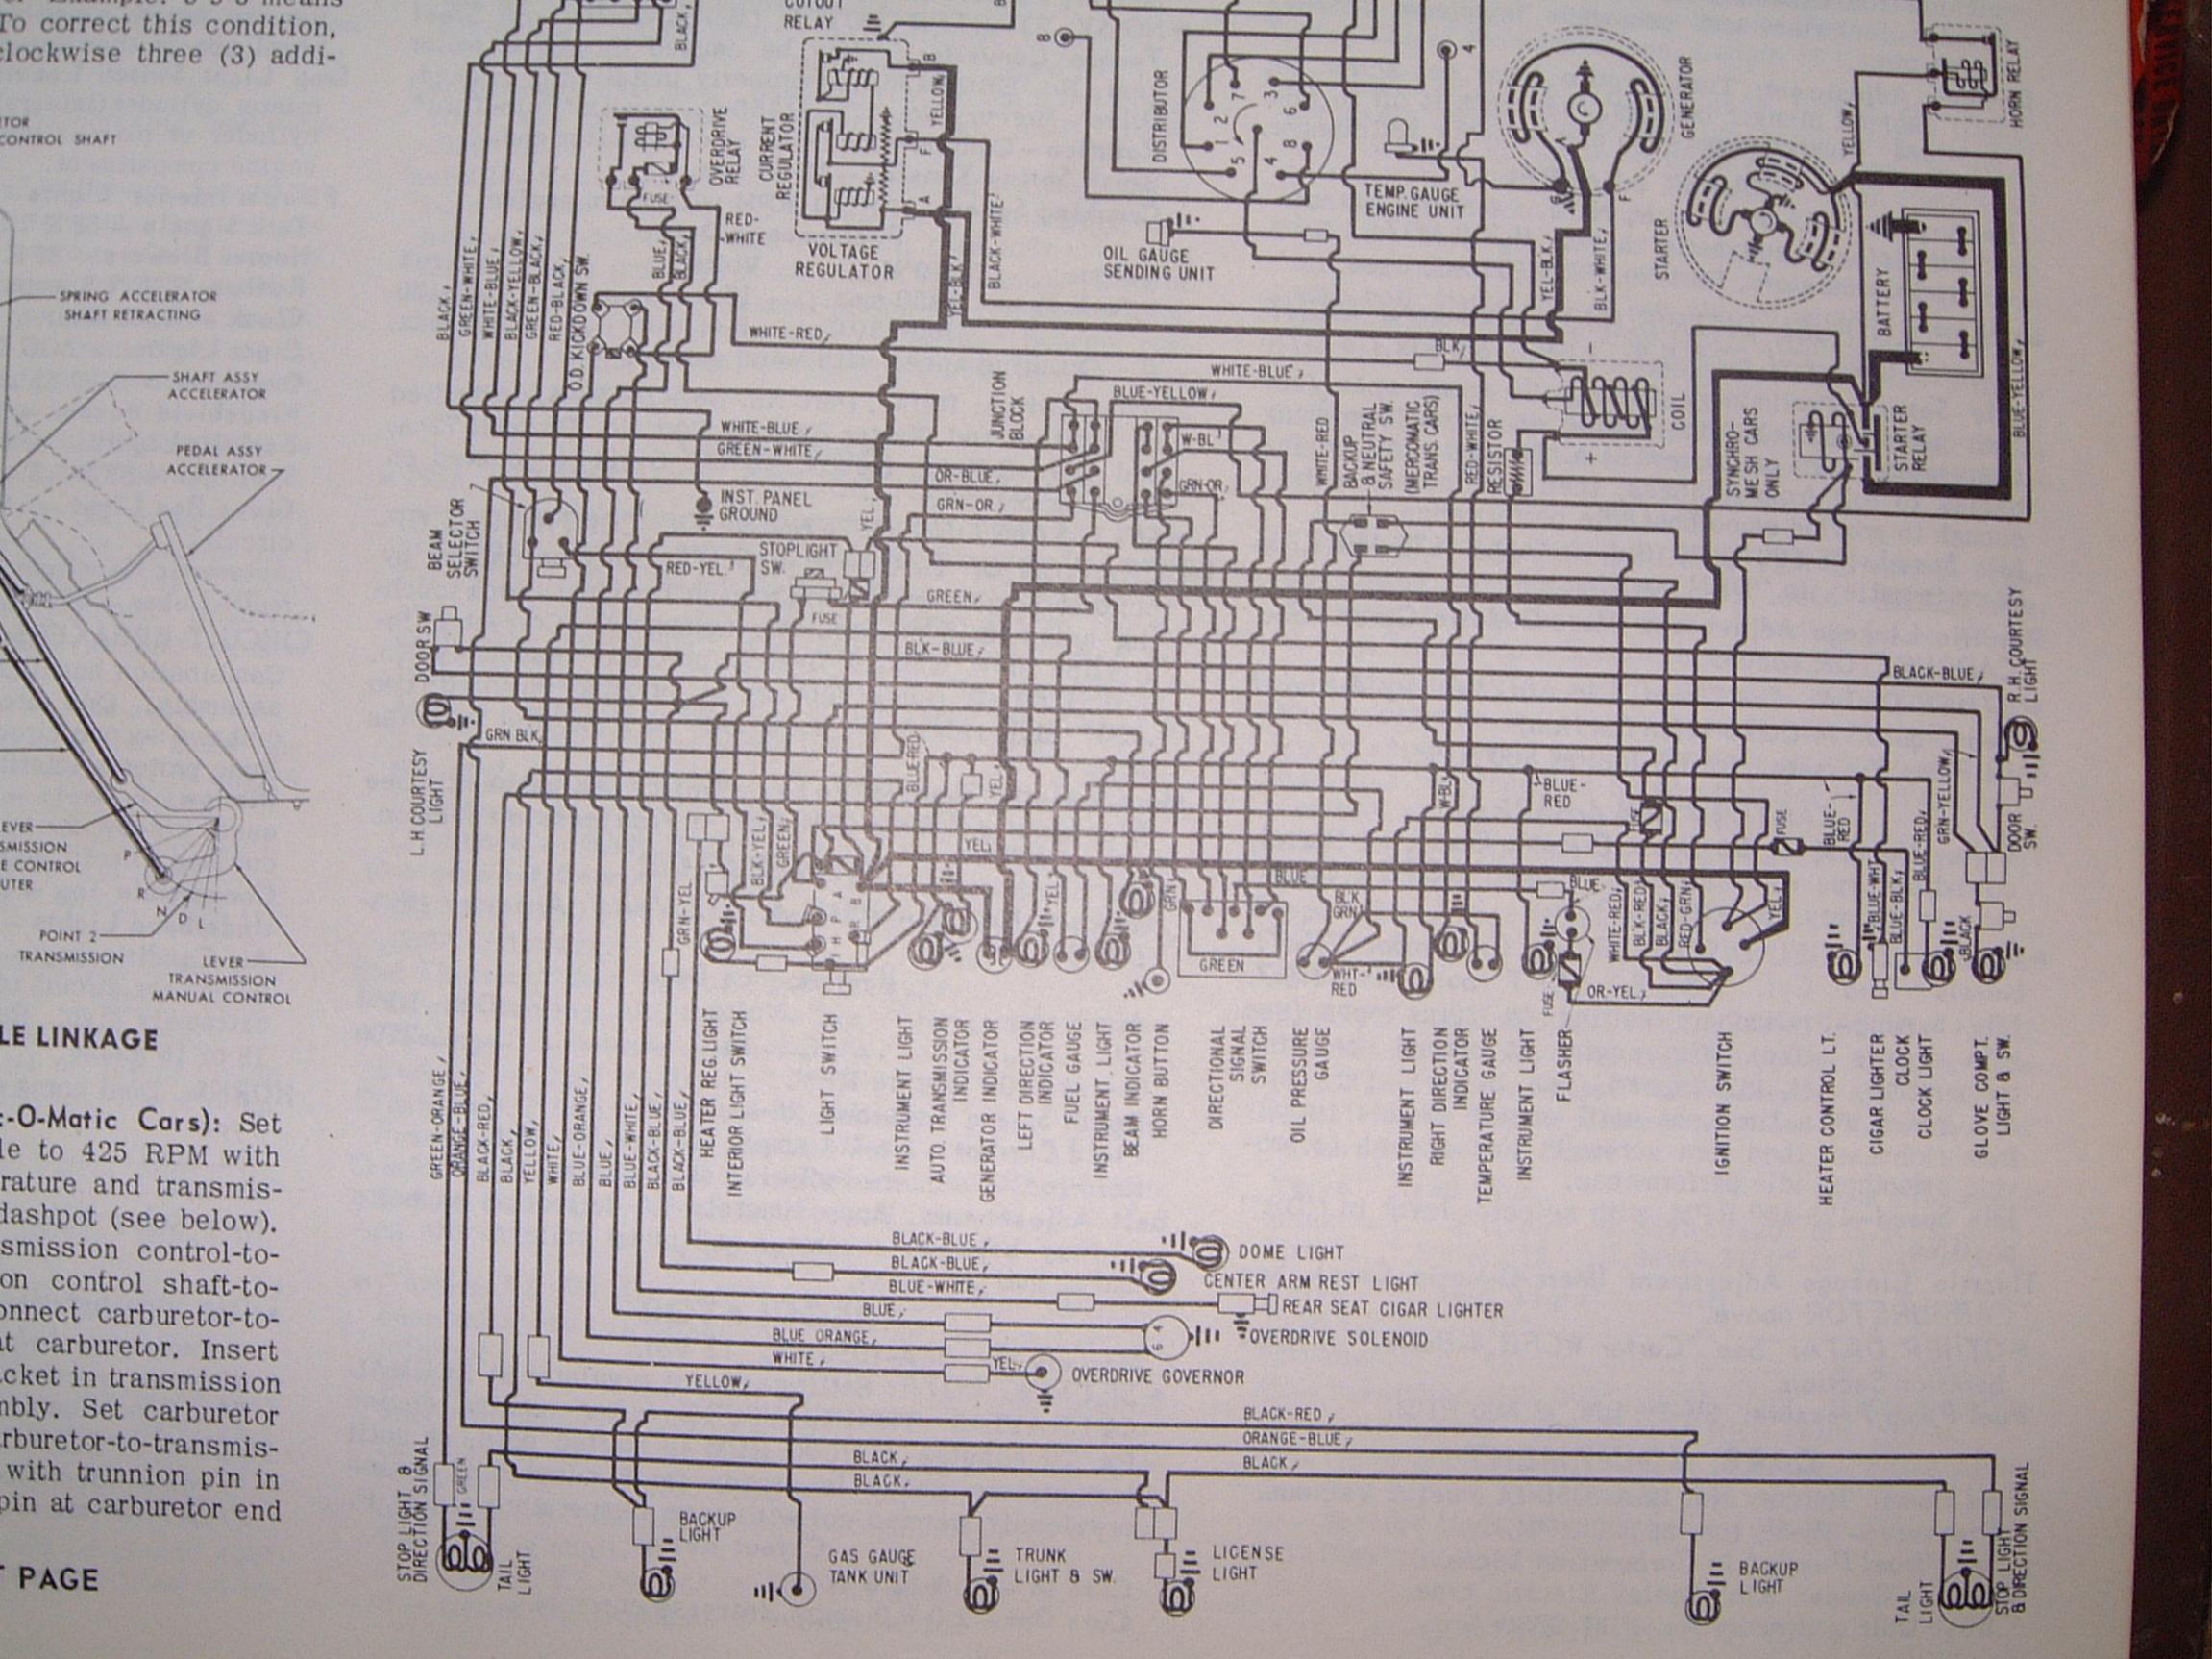 1956 Mercury Monterey Wiring Diagram Motorcycle Electrical Fuse Box Bege Wiring Diagram